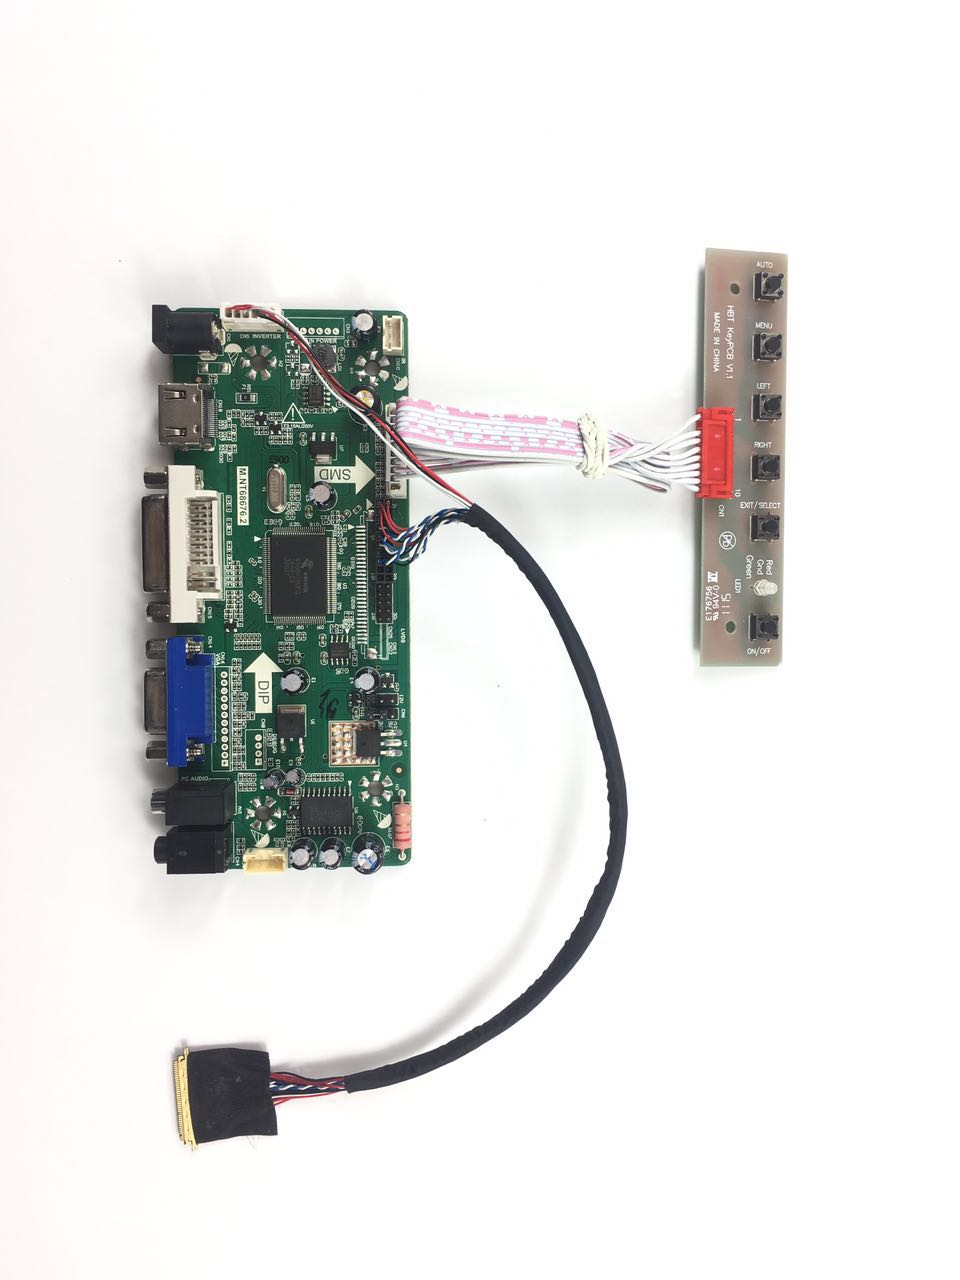 VGA DVI HDMI LCD Controller Board Kit for Samsung X170 Lenovo U150 E125 Asus U24E Acer AS1551 B116XW02 LED 1366x768 материнская плата asus h81m r c si h81 socket 1150 2xddr3 2xsata3 1xpci e16x 2xusb3 0 d sub dvi vga glan matx